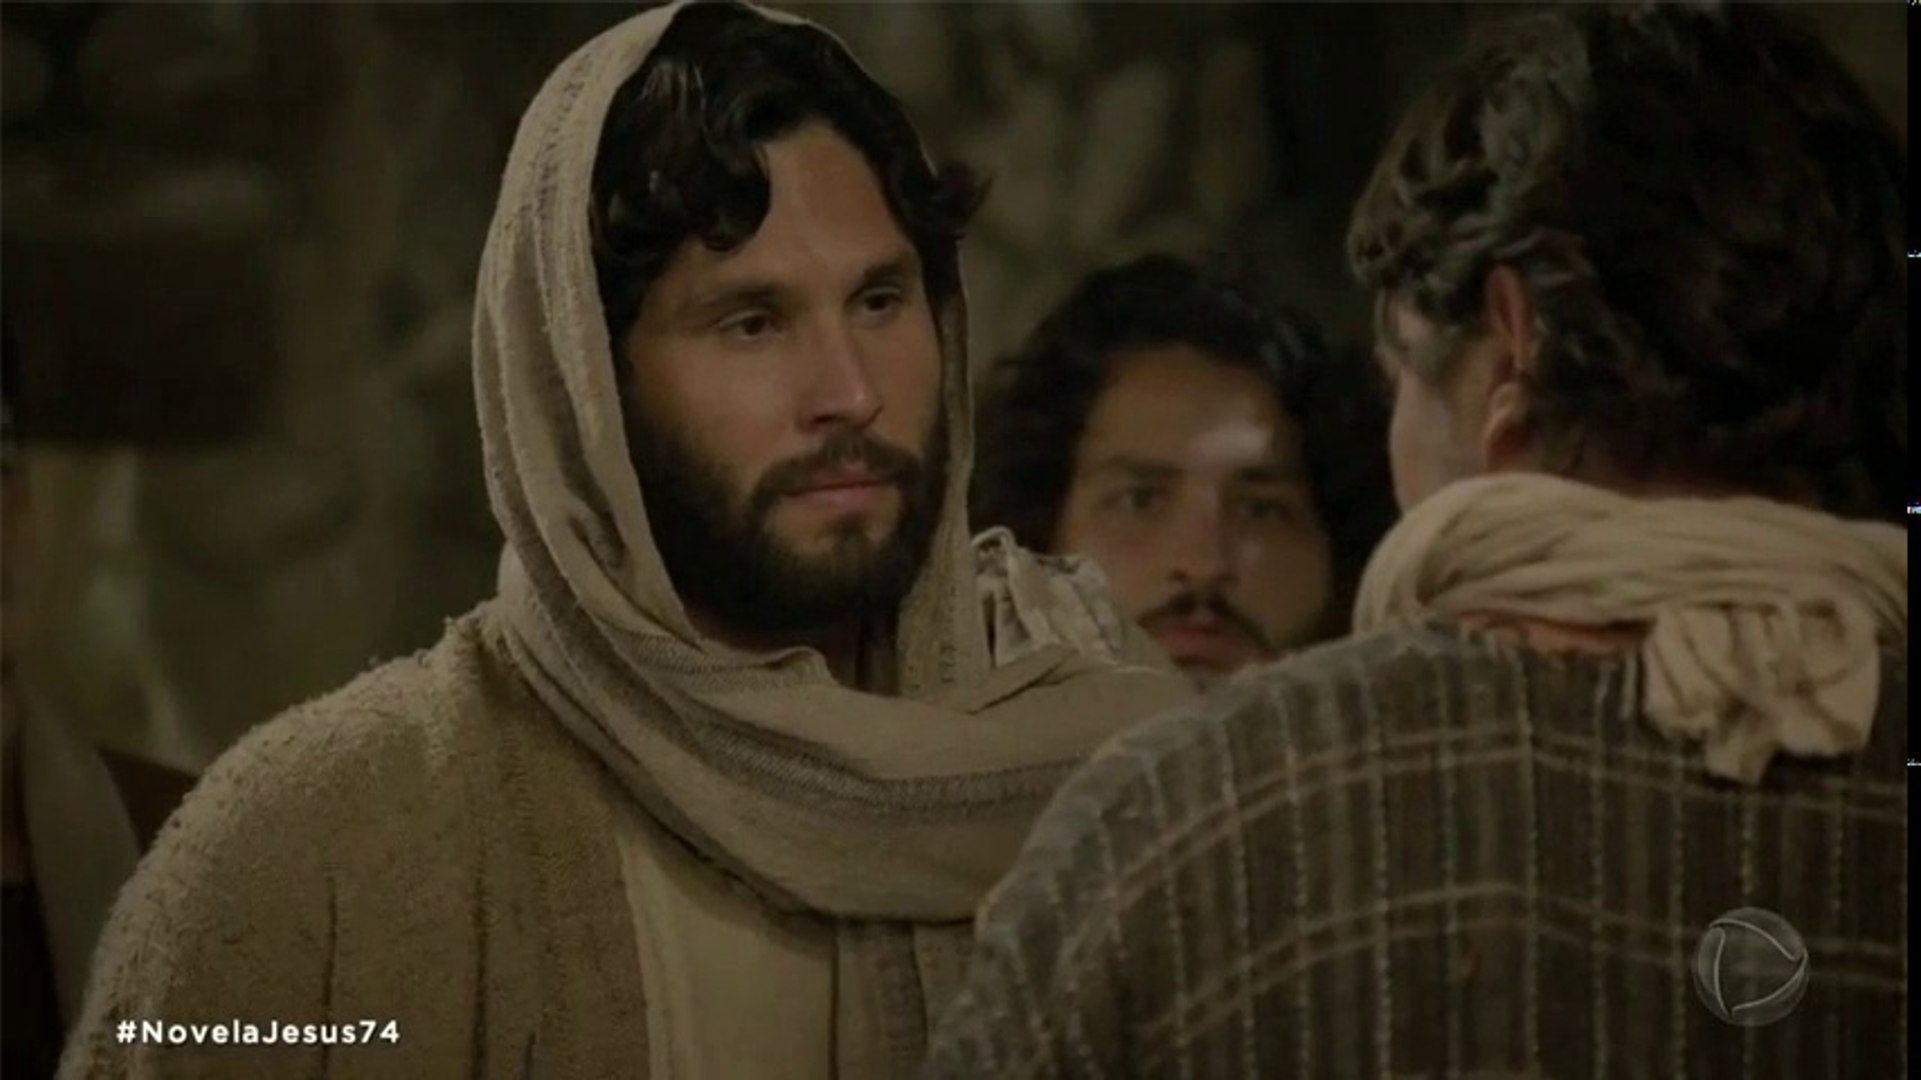 Novela Jesus Capítulo 74 – COMPLETO NA ÍNTEGRA – 02/11/18 em HD